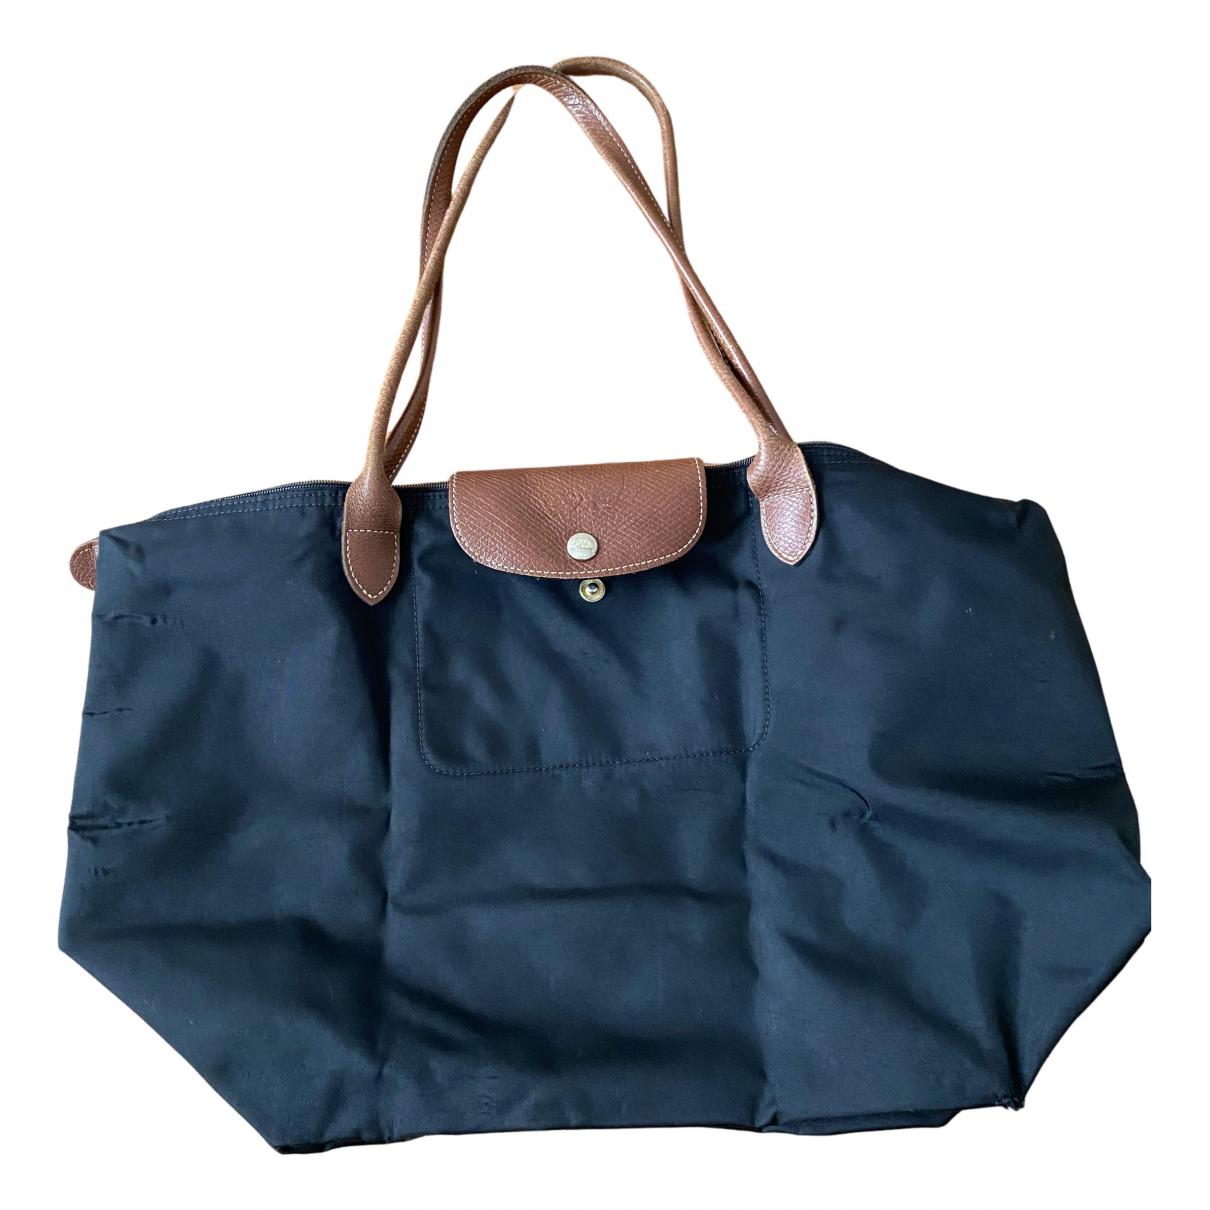 Bandolera Pliage  Longchamp